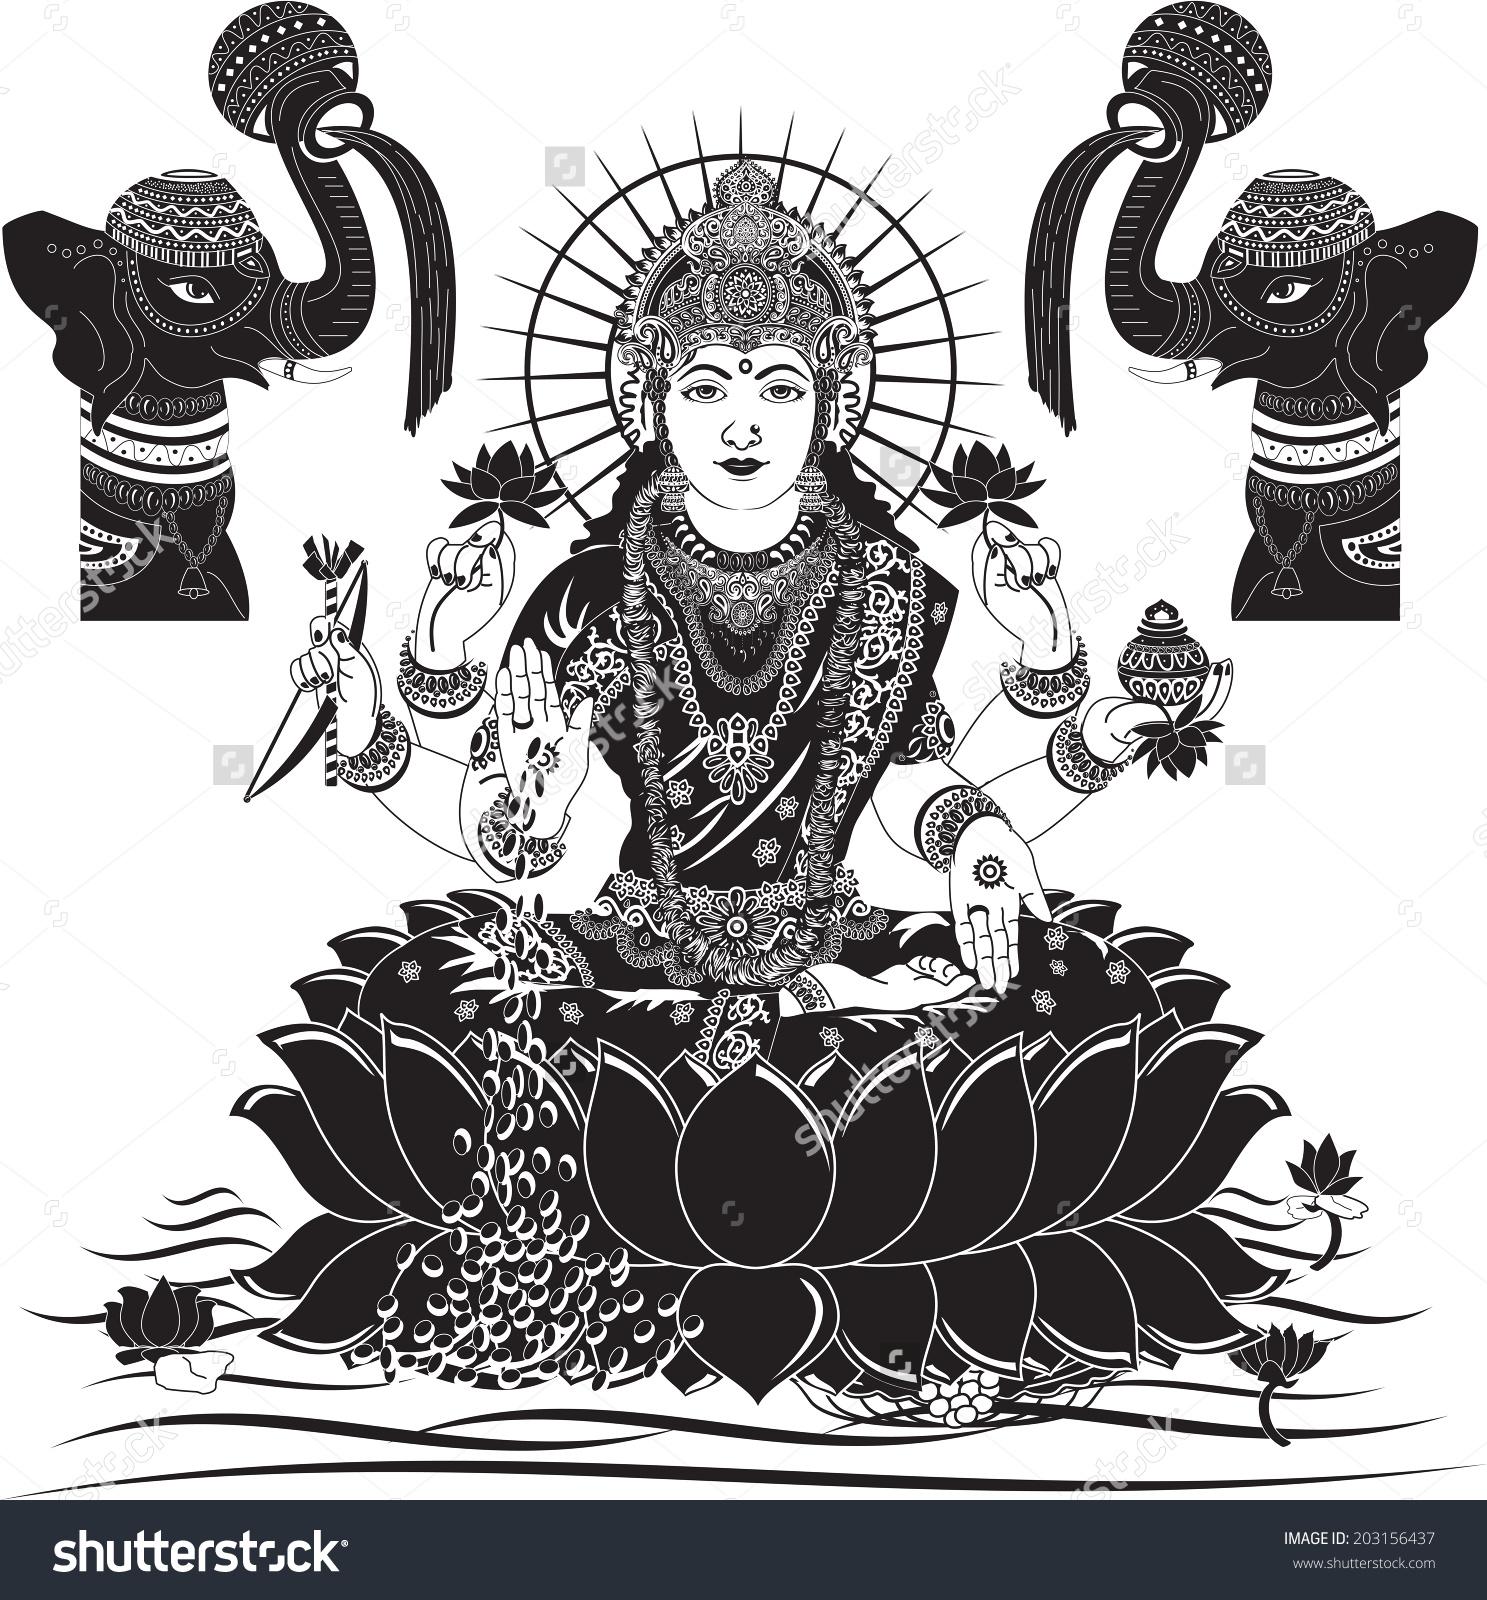 Goddess mahalakshmi clipart.